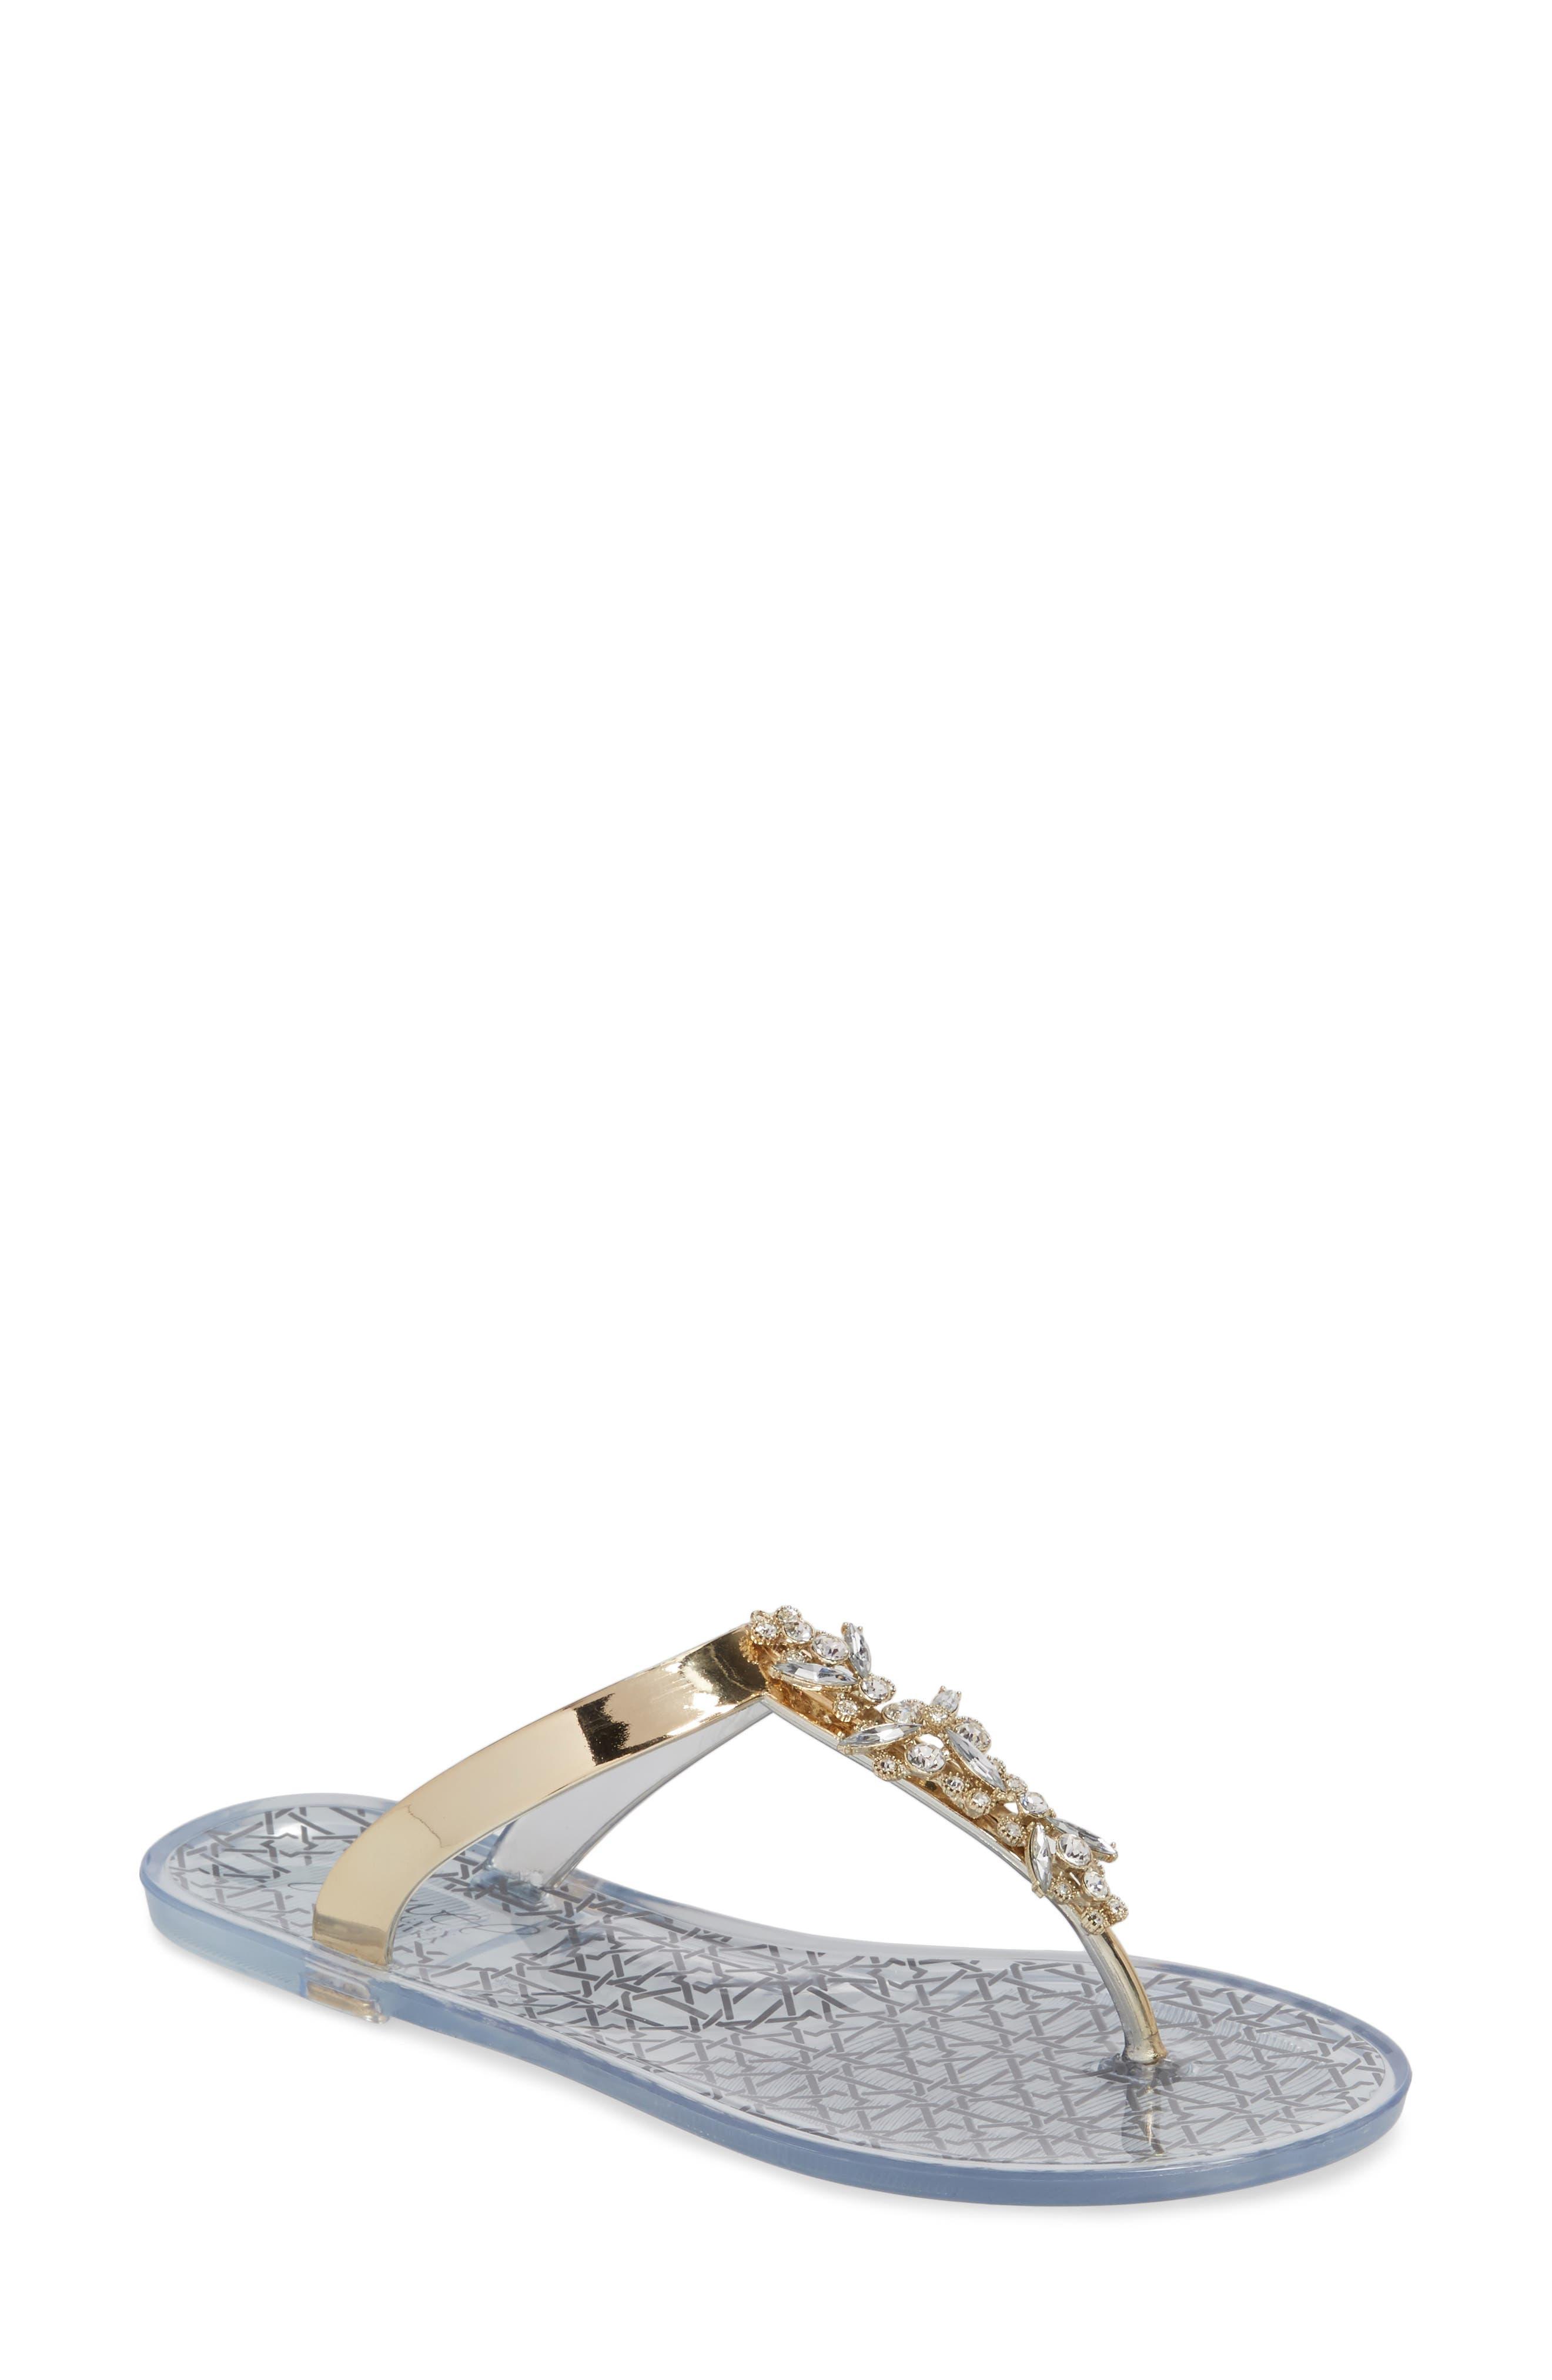 Gracia Embellished Sandal,                             Main thumbnail 4, color,